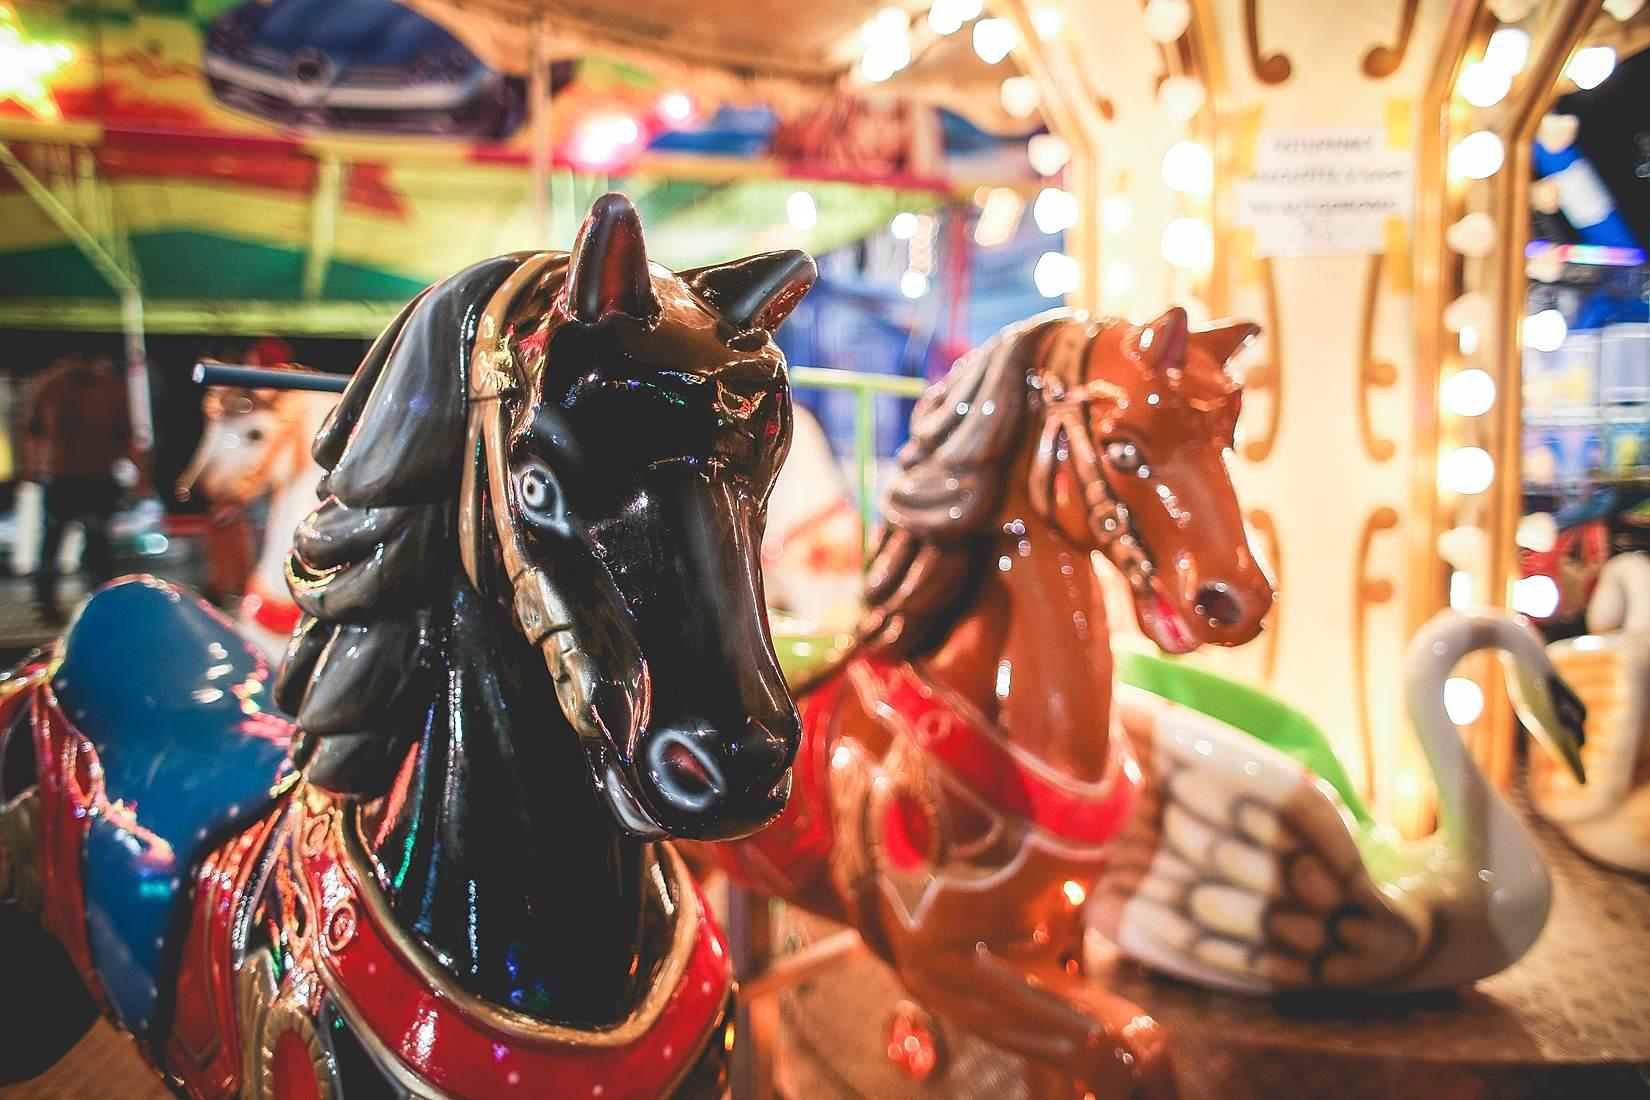 Traditional Carousel Horses on a Fun Fair Ride